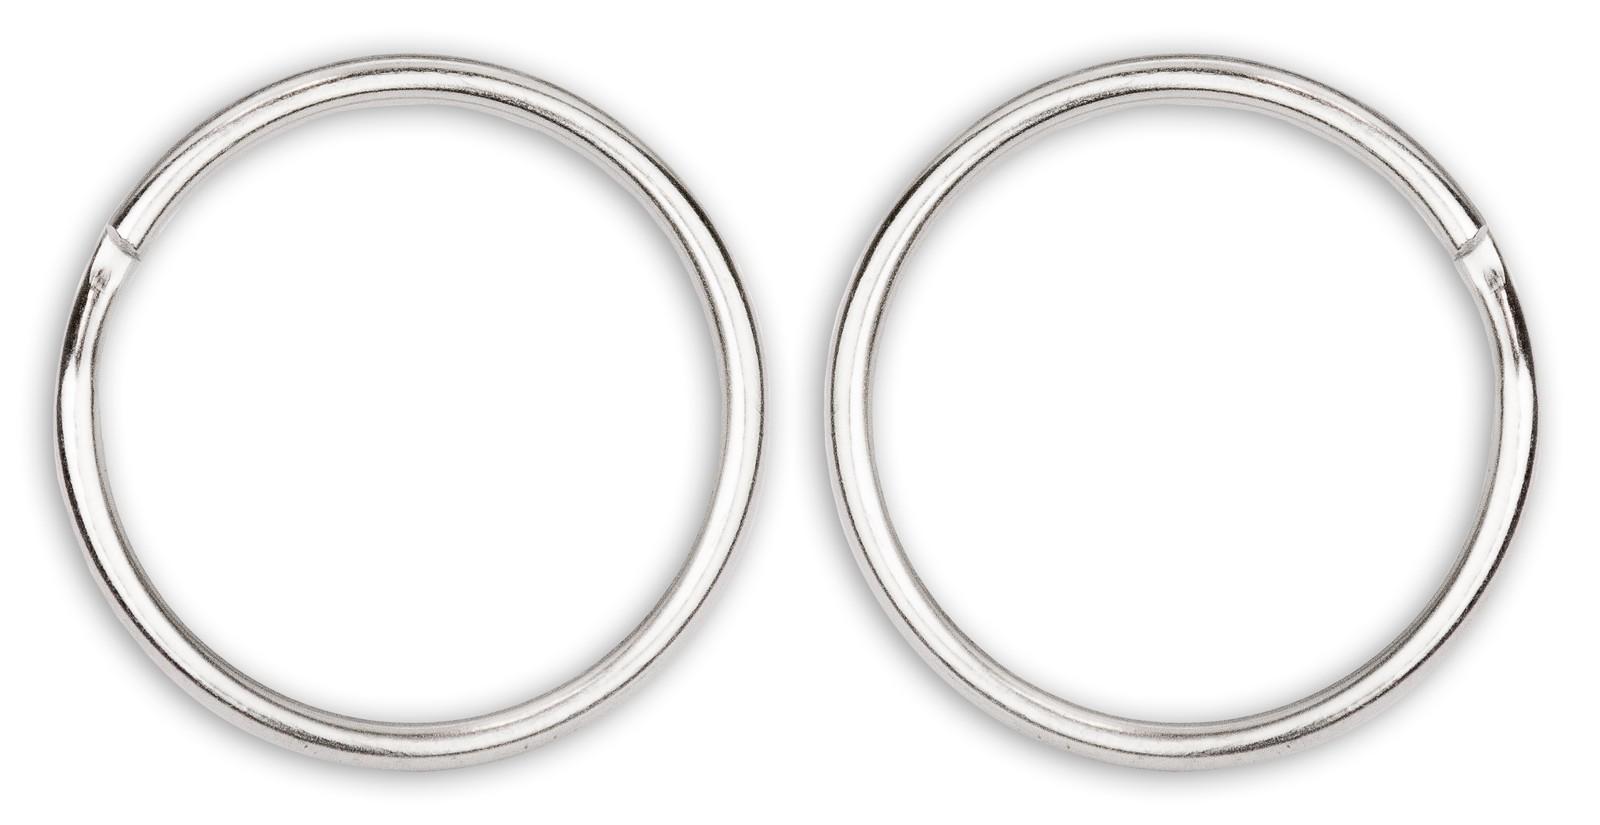 Buy 1 Inch Split Ring Key Chain Rings Closeout Online 1336d4e0b